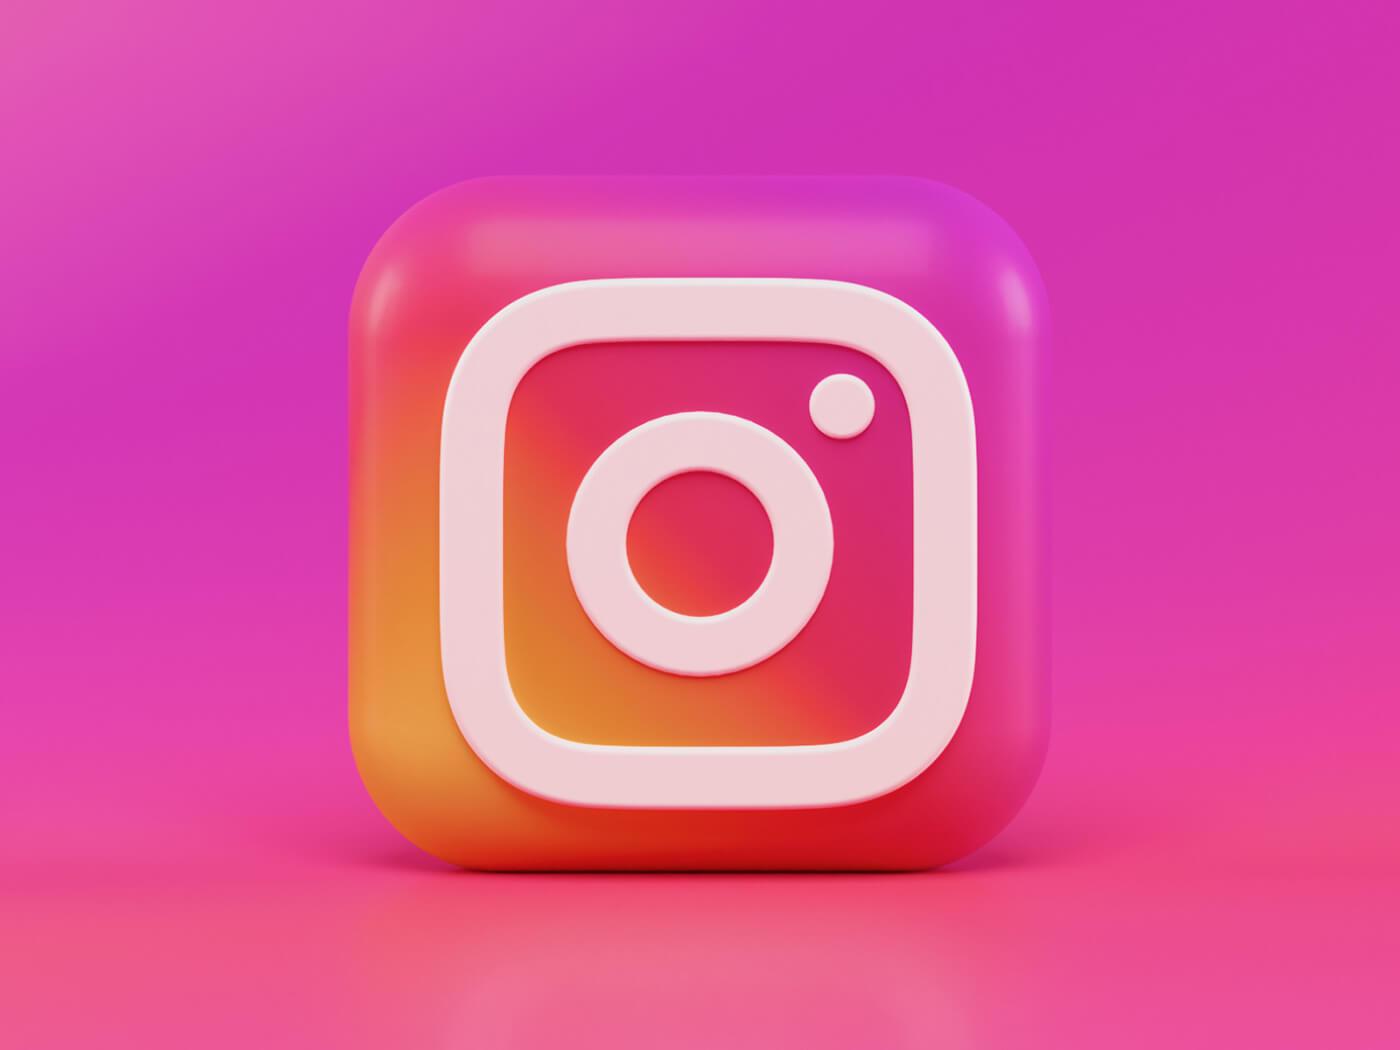 иконка инстаграм